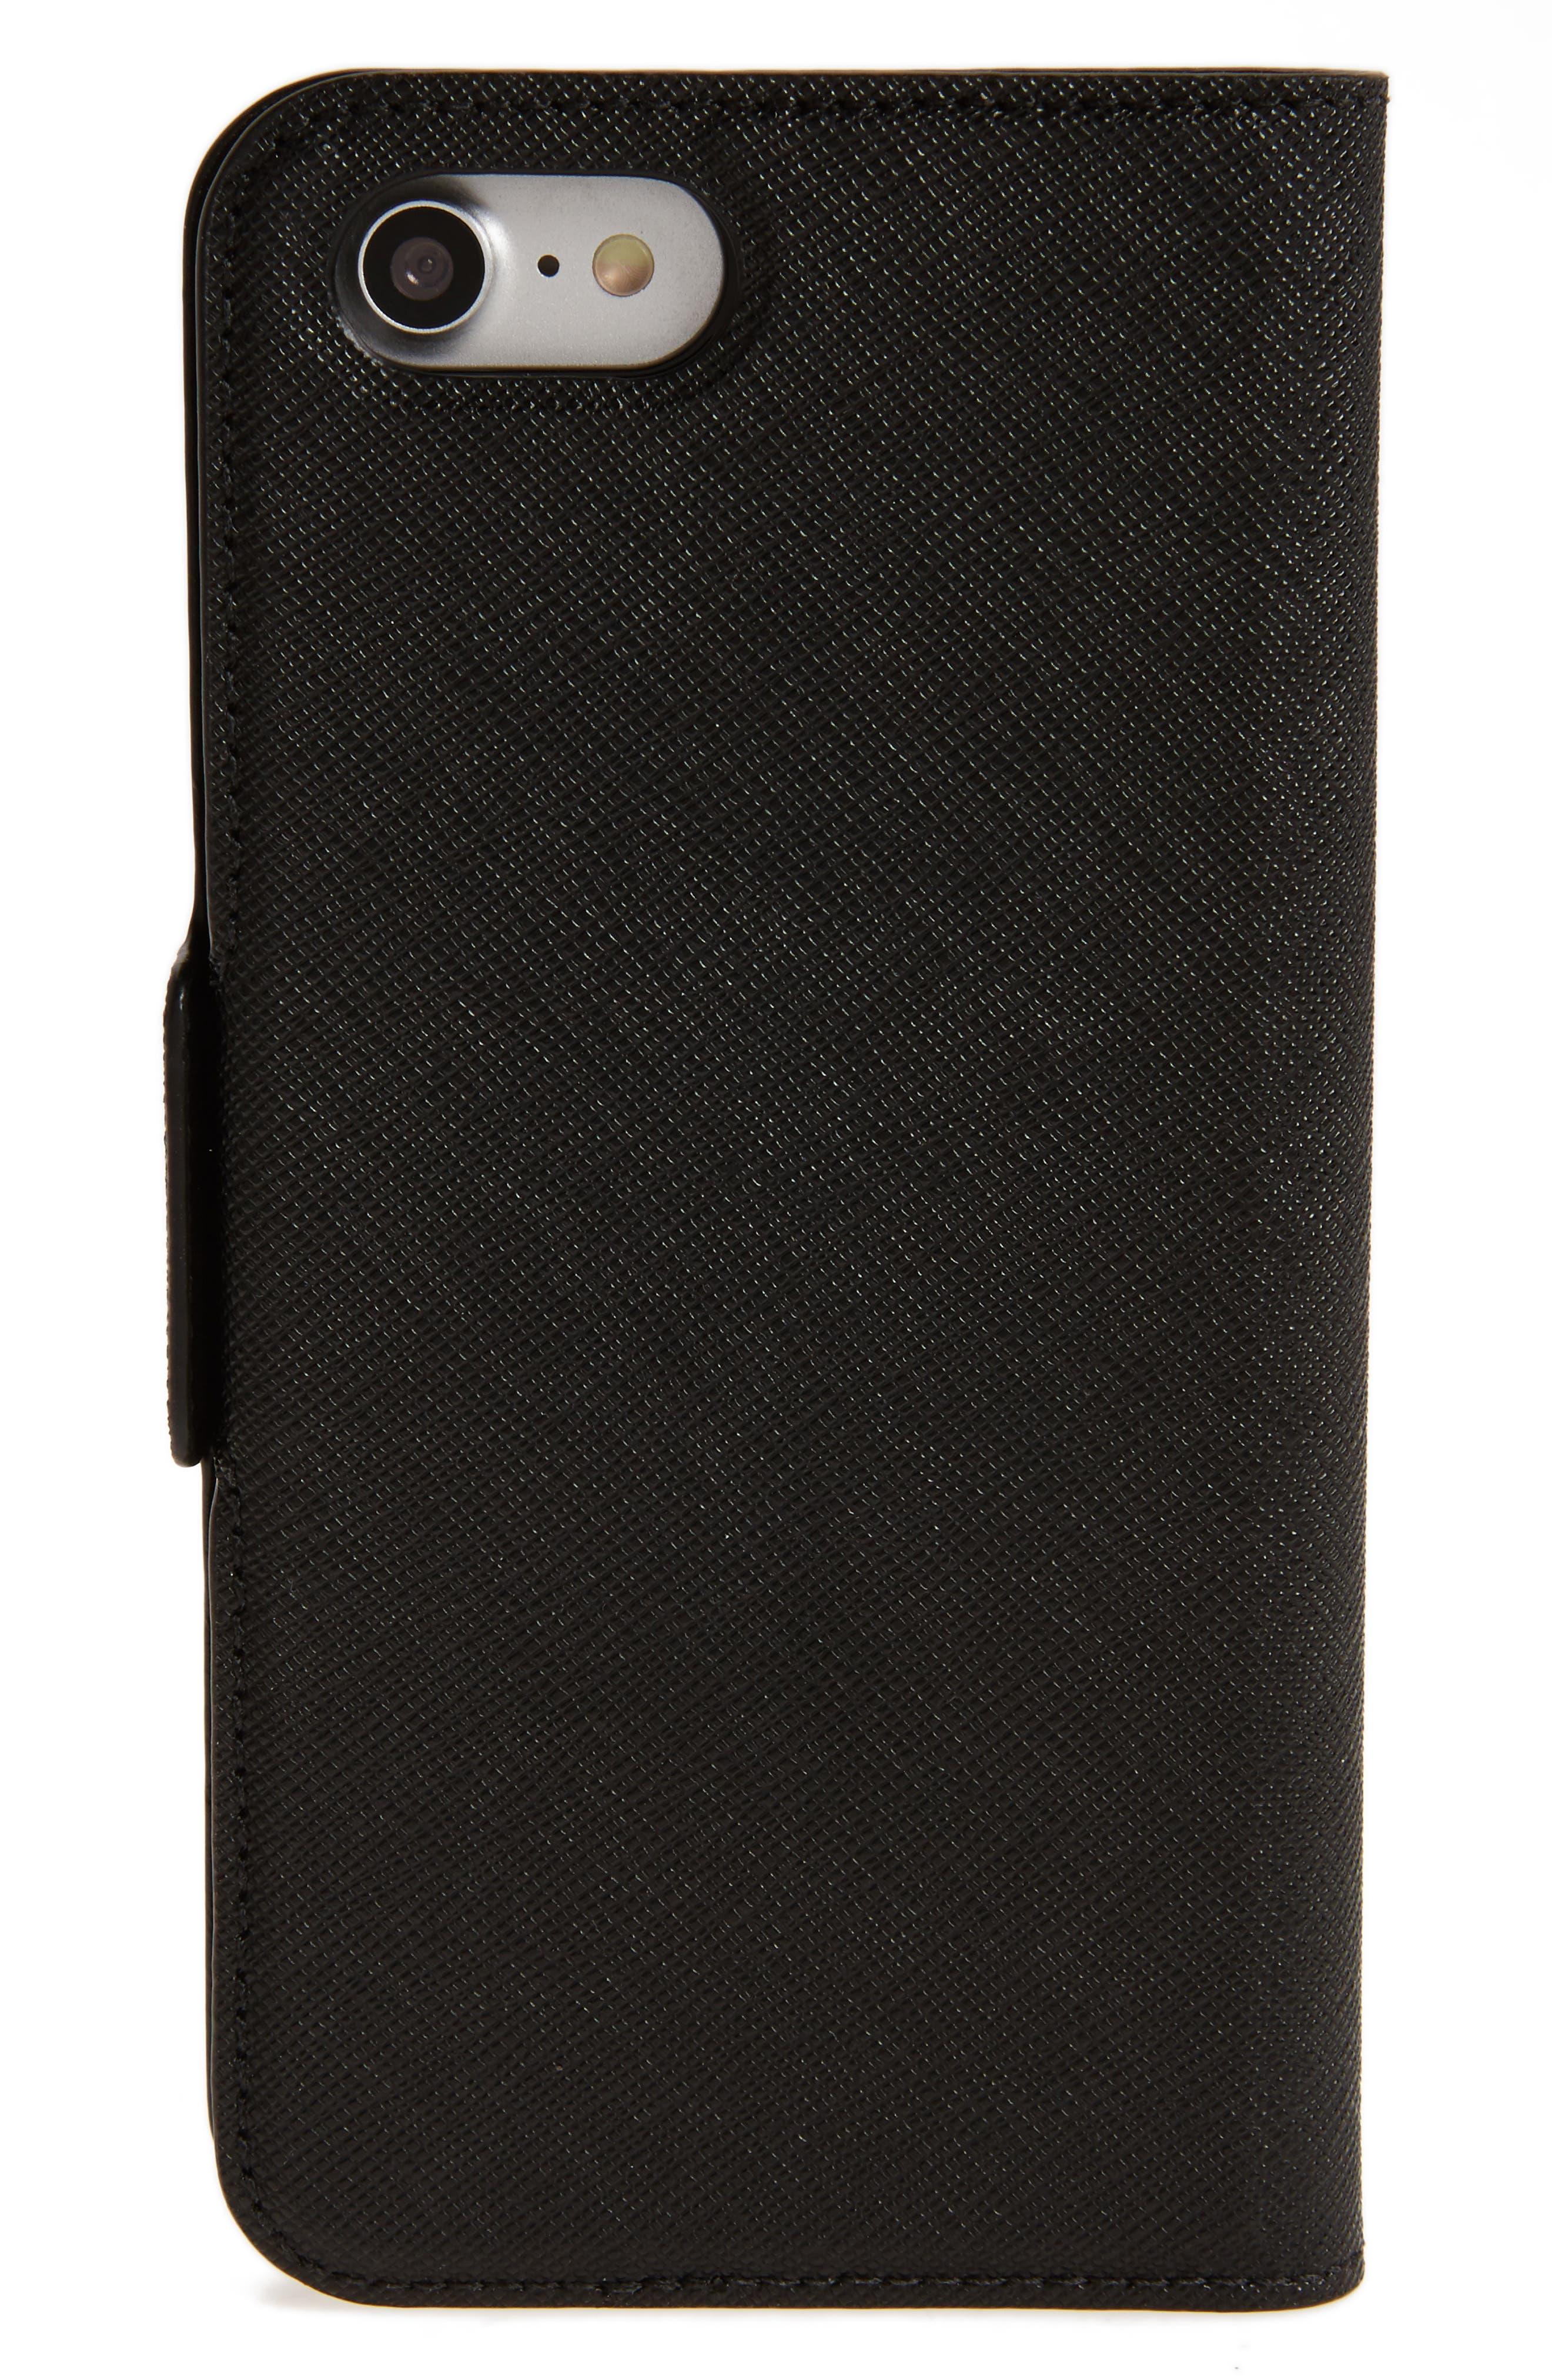 antoine appliqué leather iPhone 7/8 folio case,                             Alternate thumbnail 2, color,                             Black Multi